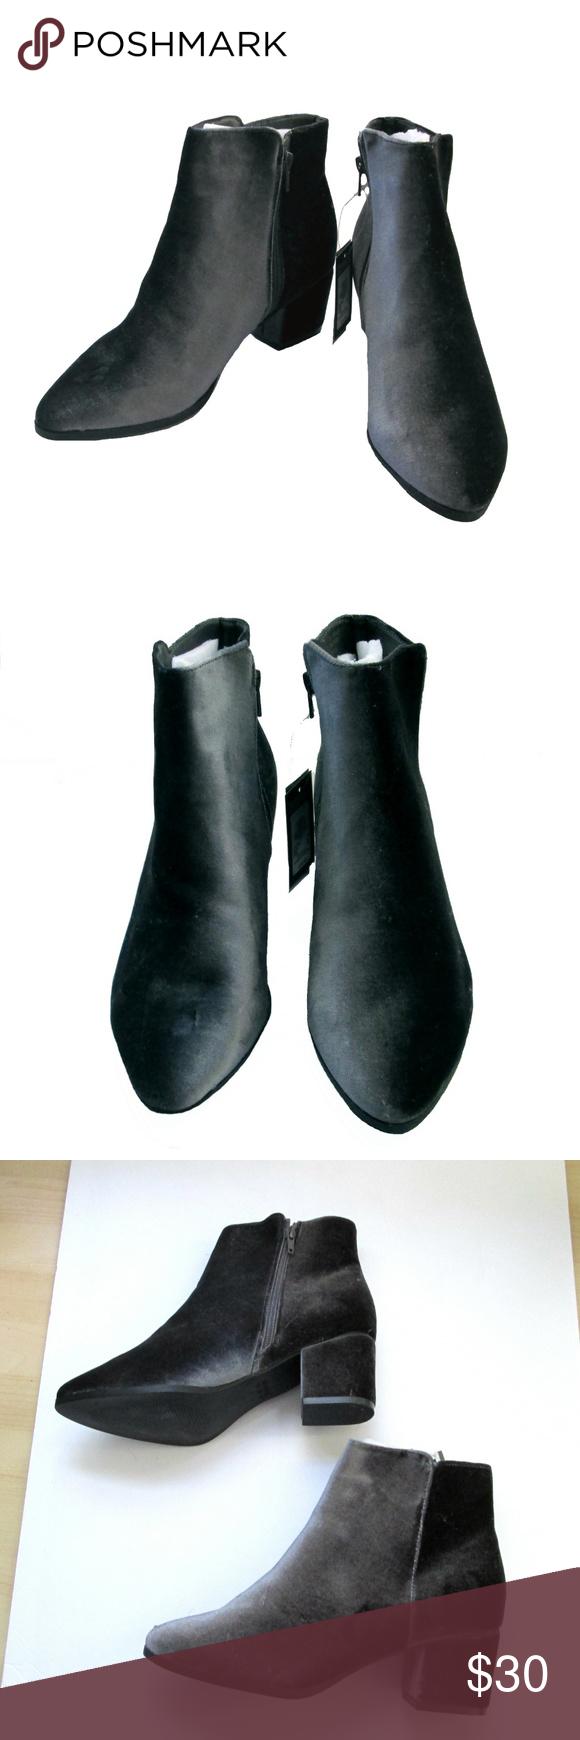 Primark Grey Velvet Ankle Boots Size